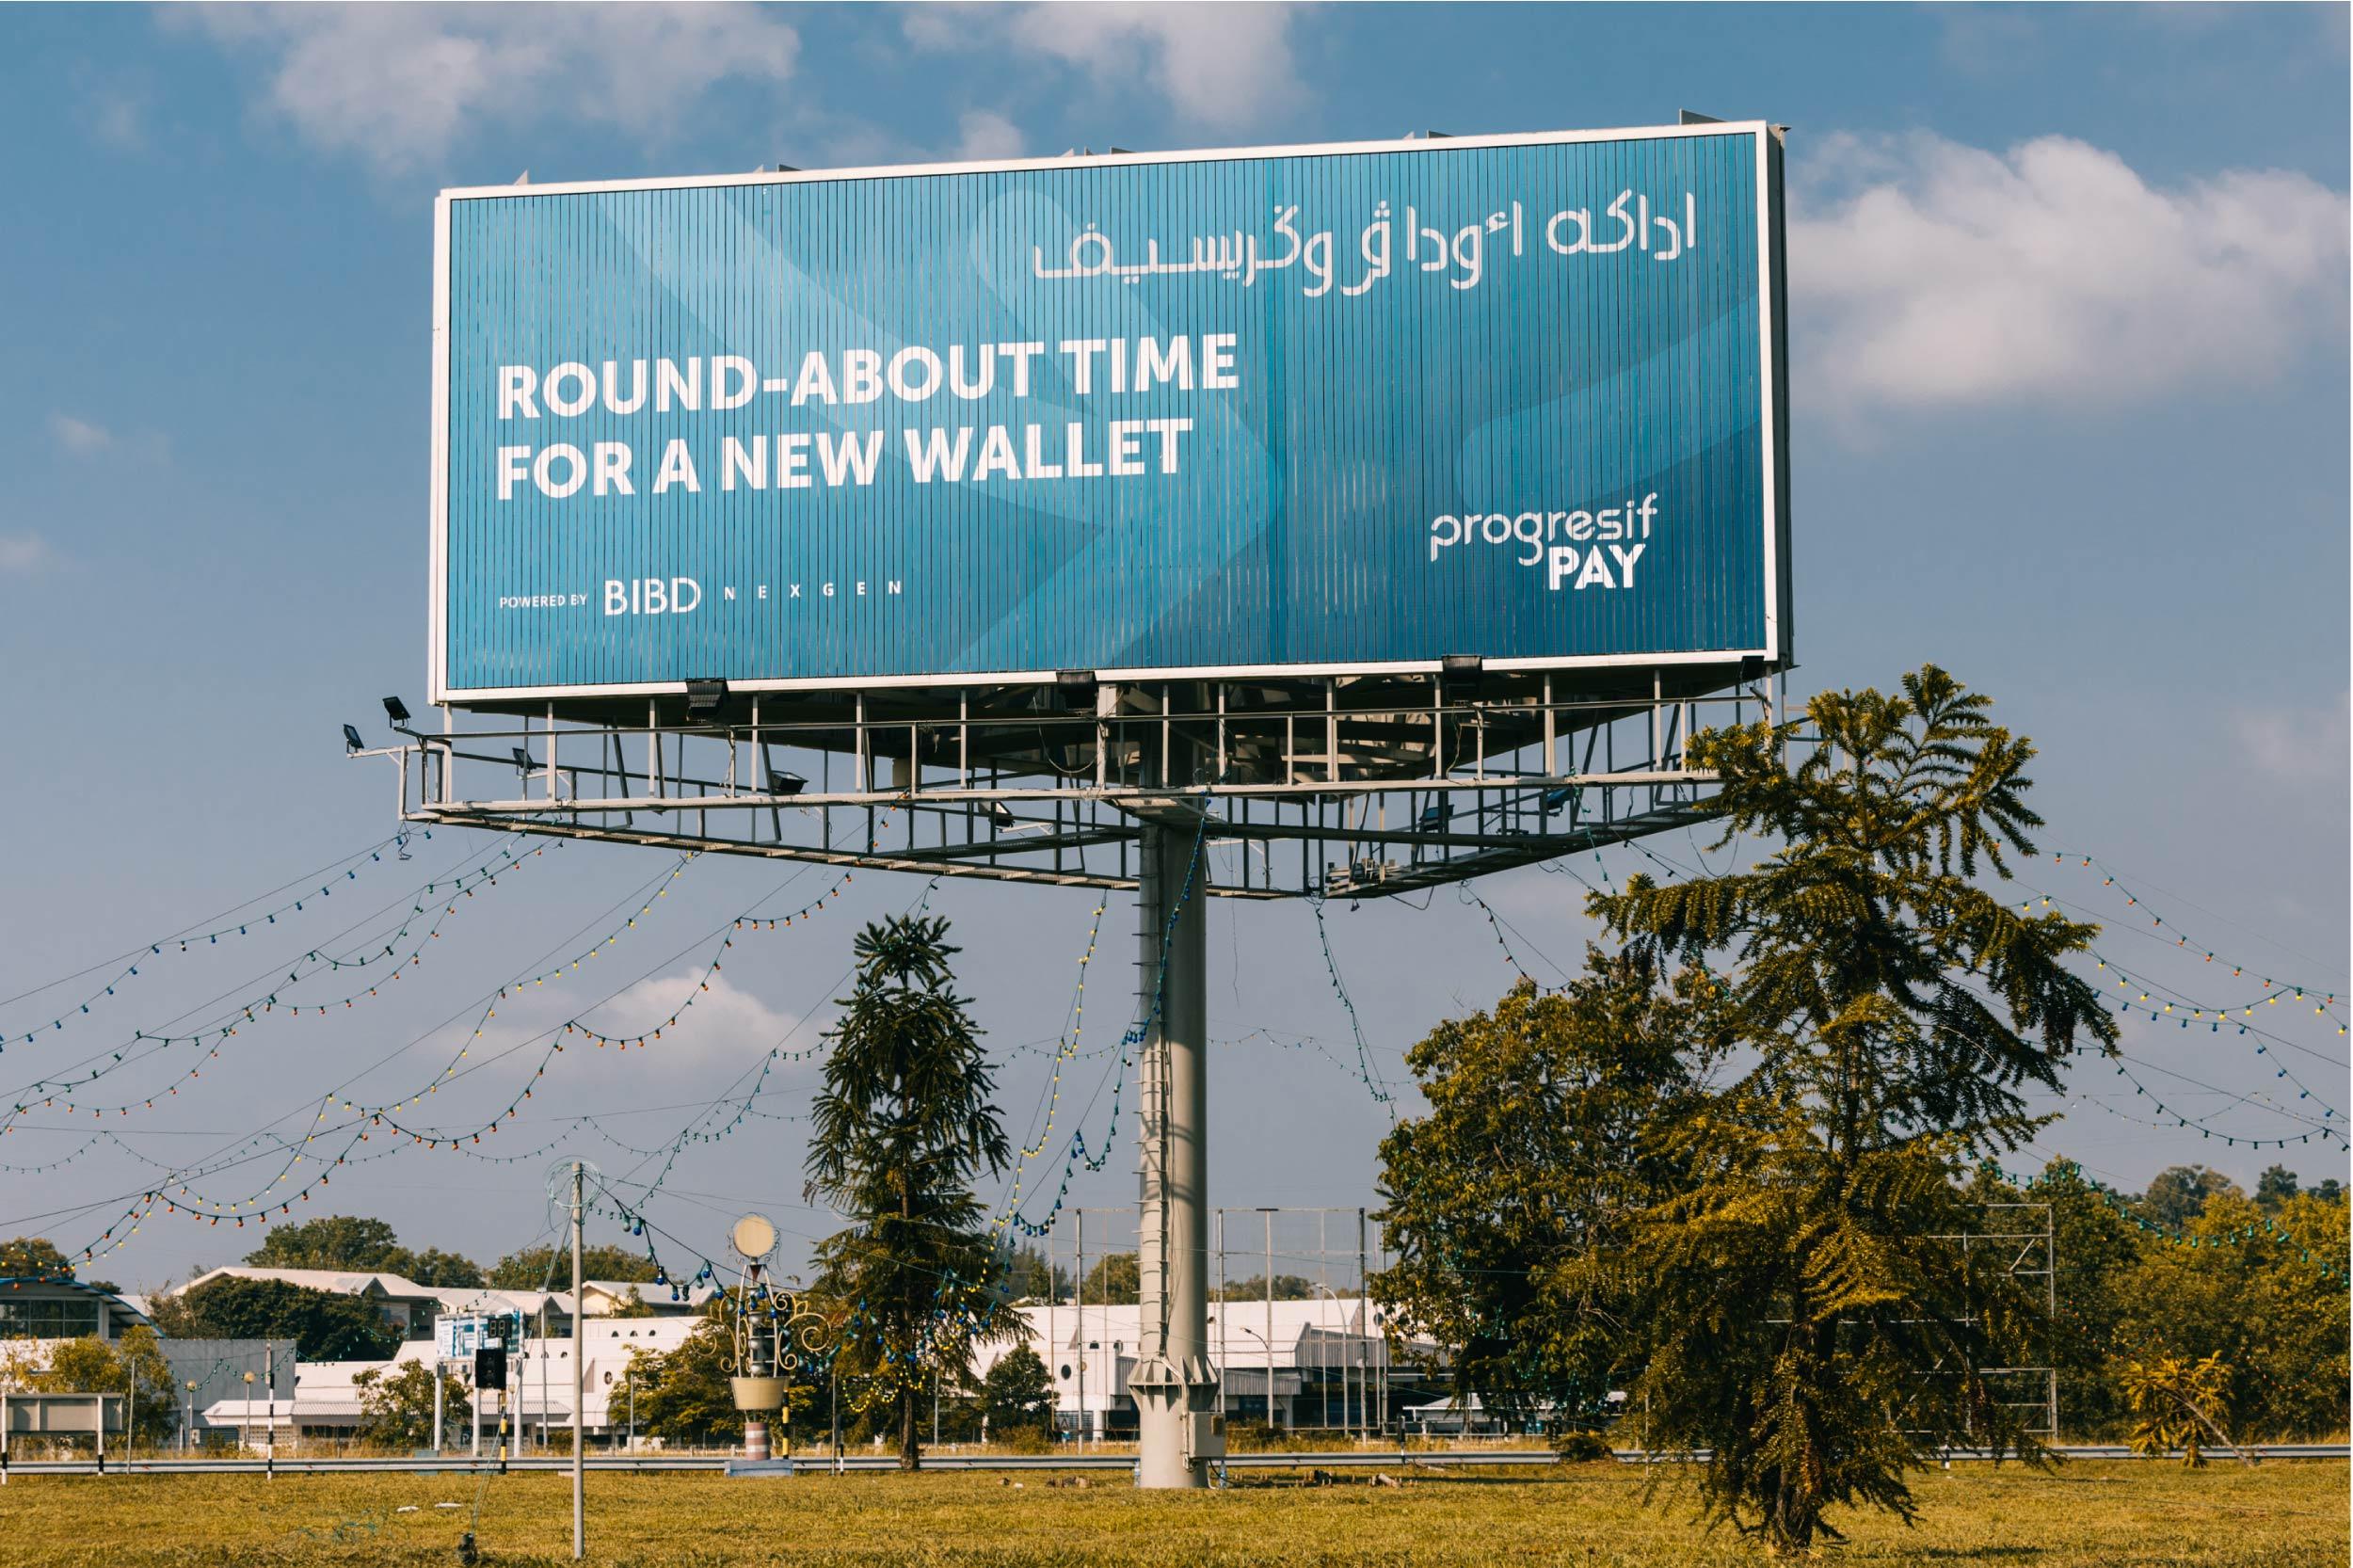 Progresif Pay_laptop - billboard 1.jpg